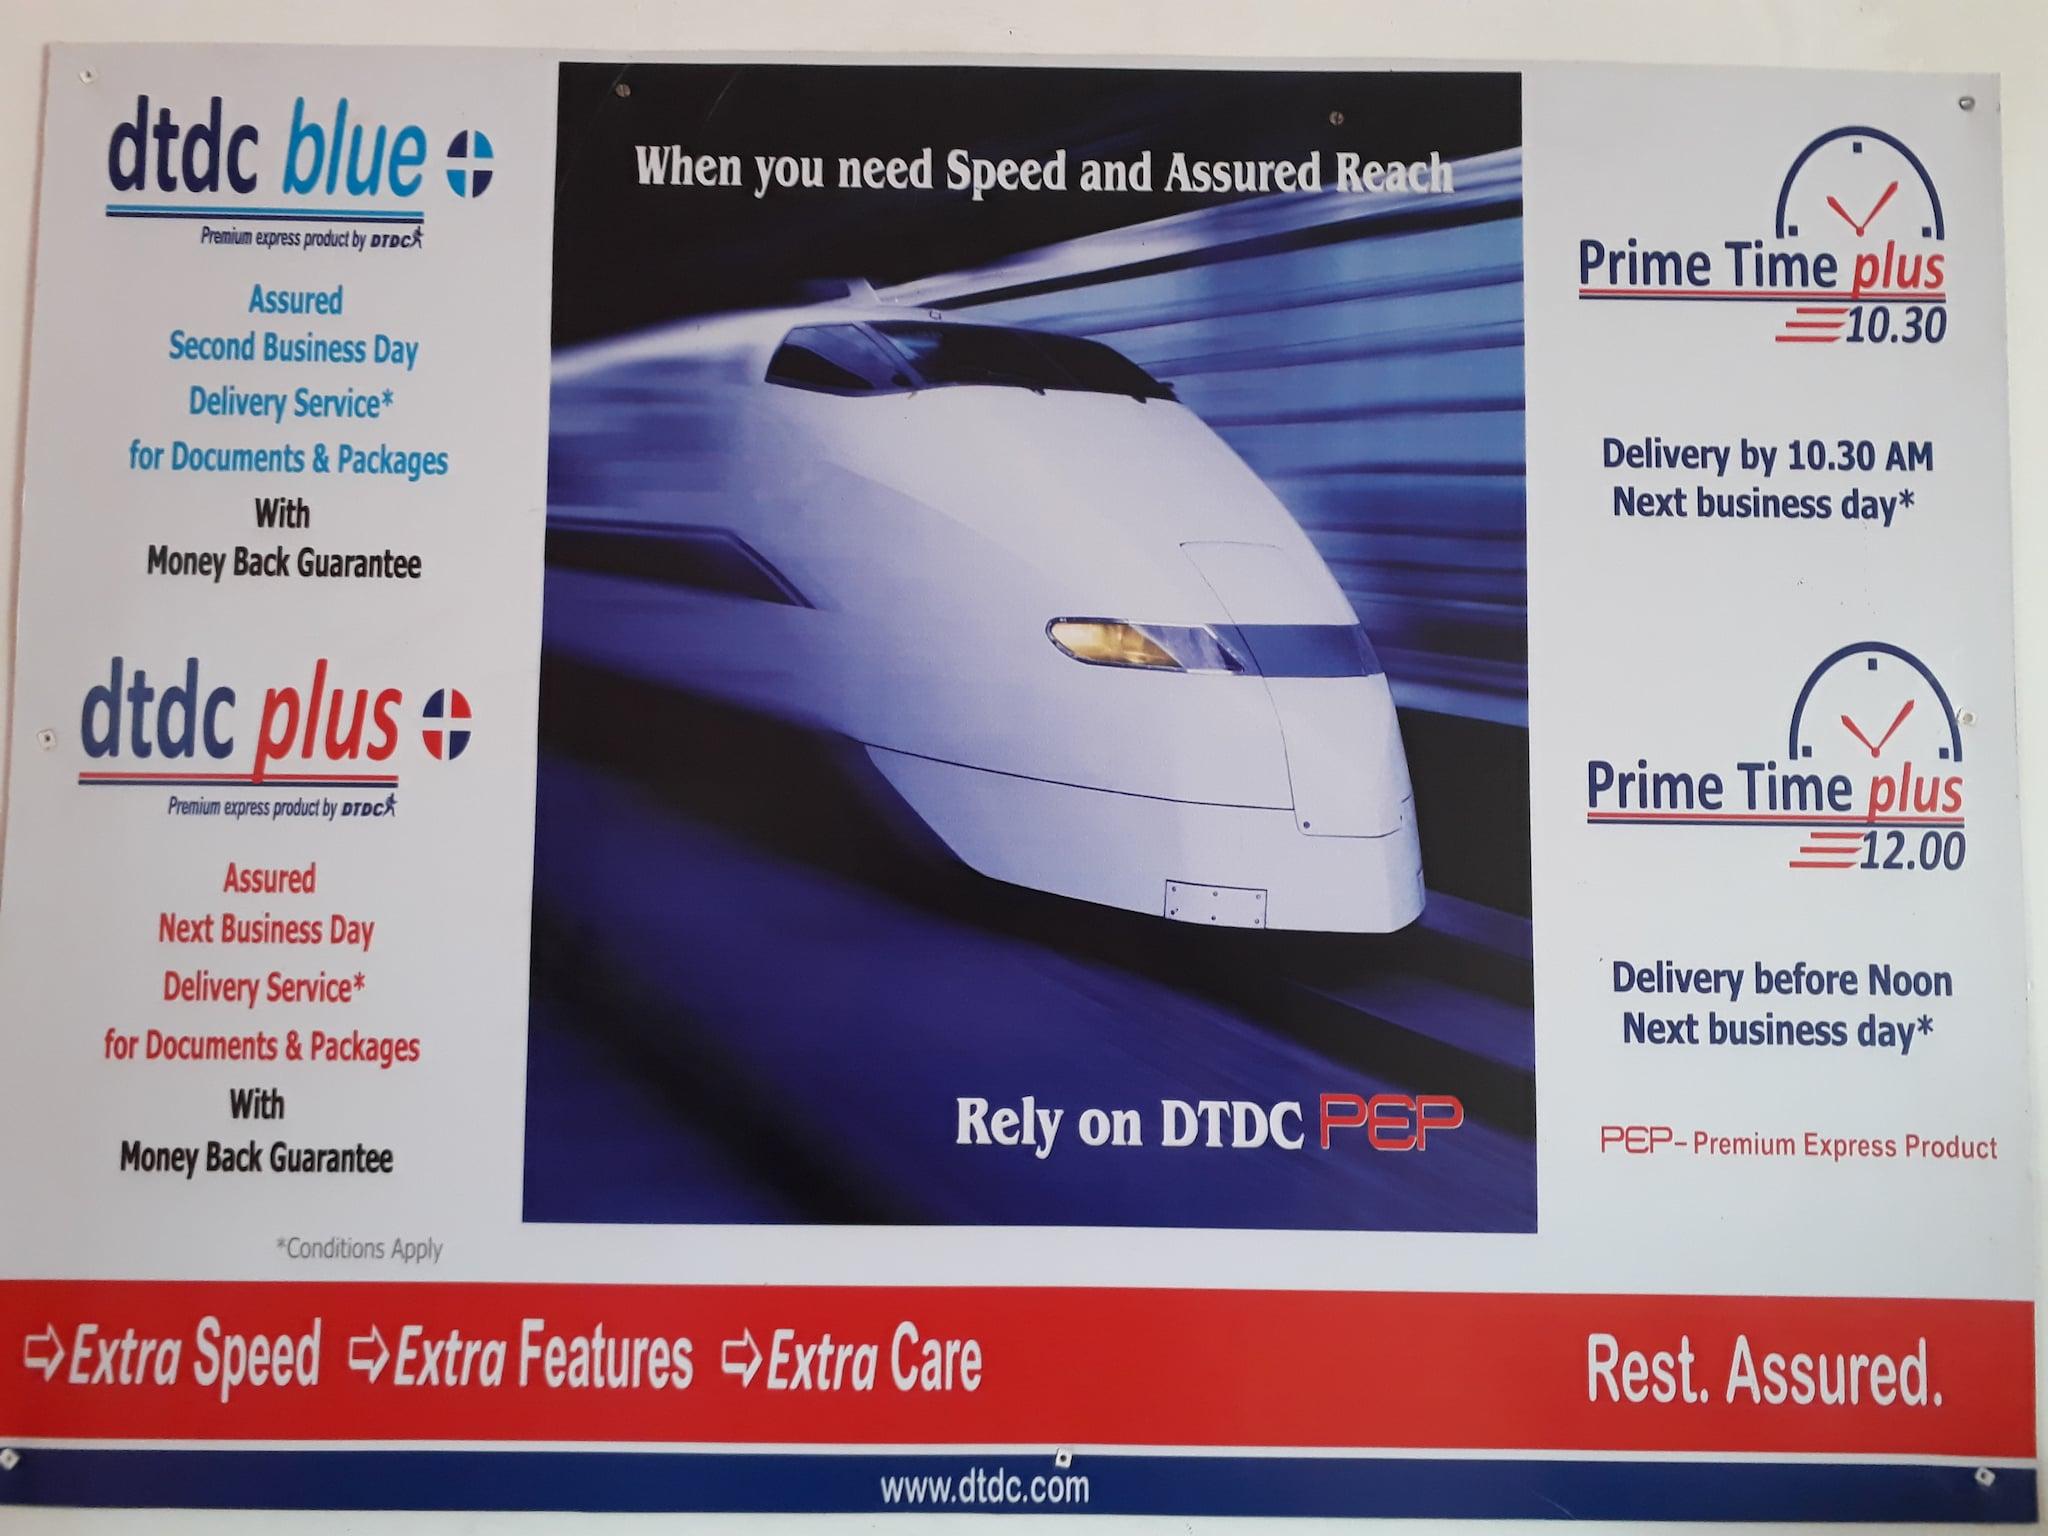 Preferred Courier Services in Pranpura, Rewari - Top Express